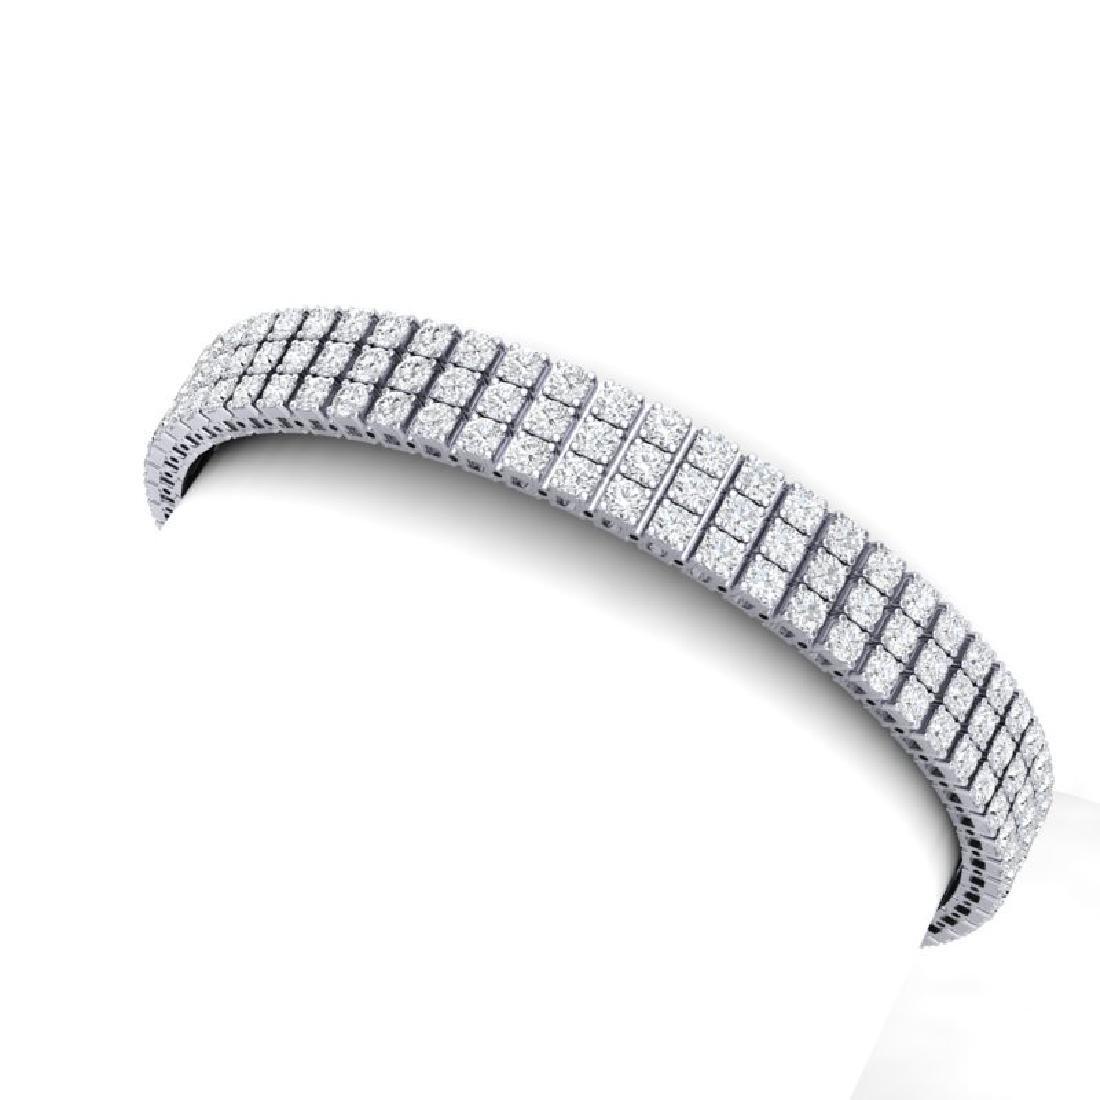 12 CTW Certified SI/I Diamond Bracelet 18K White Gold